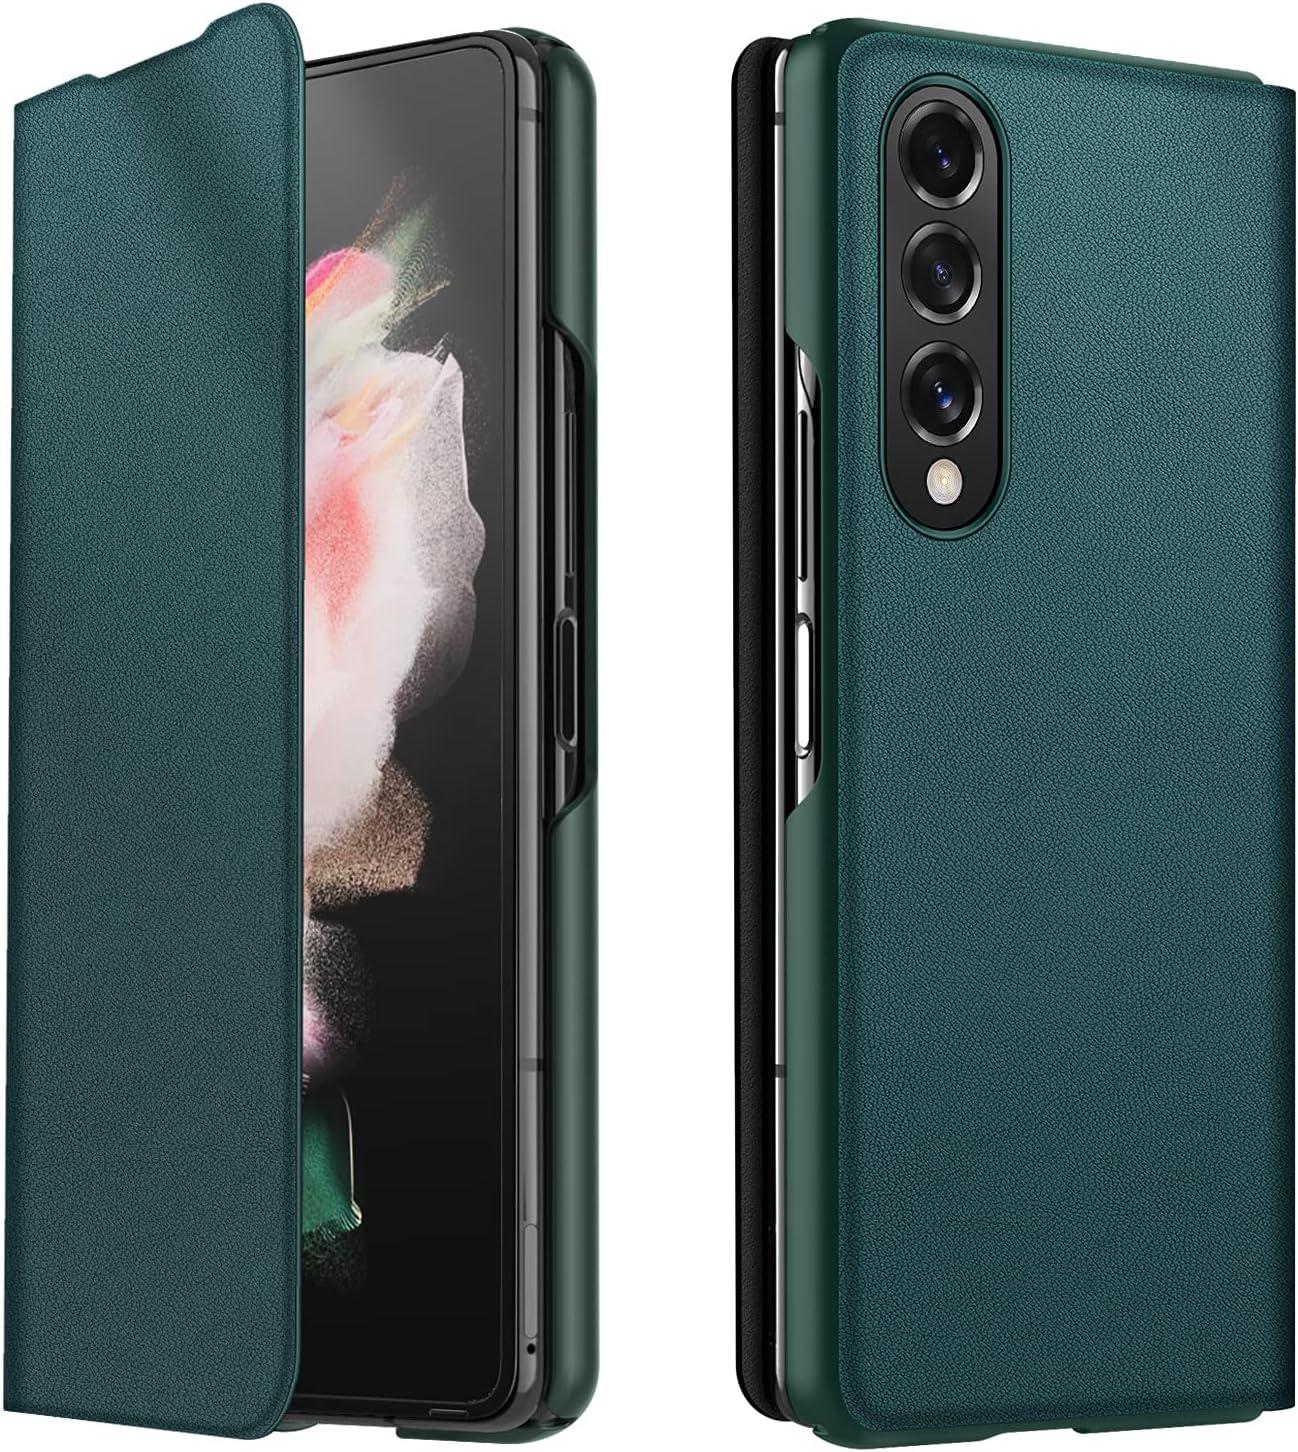 CENMASO Designed for Samsung Galaxy Z fold 3 Case, Ultra-Thin Leather Magnetic Flip Bumper Case for Galaxy z Fold 3 (2021)- Green